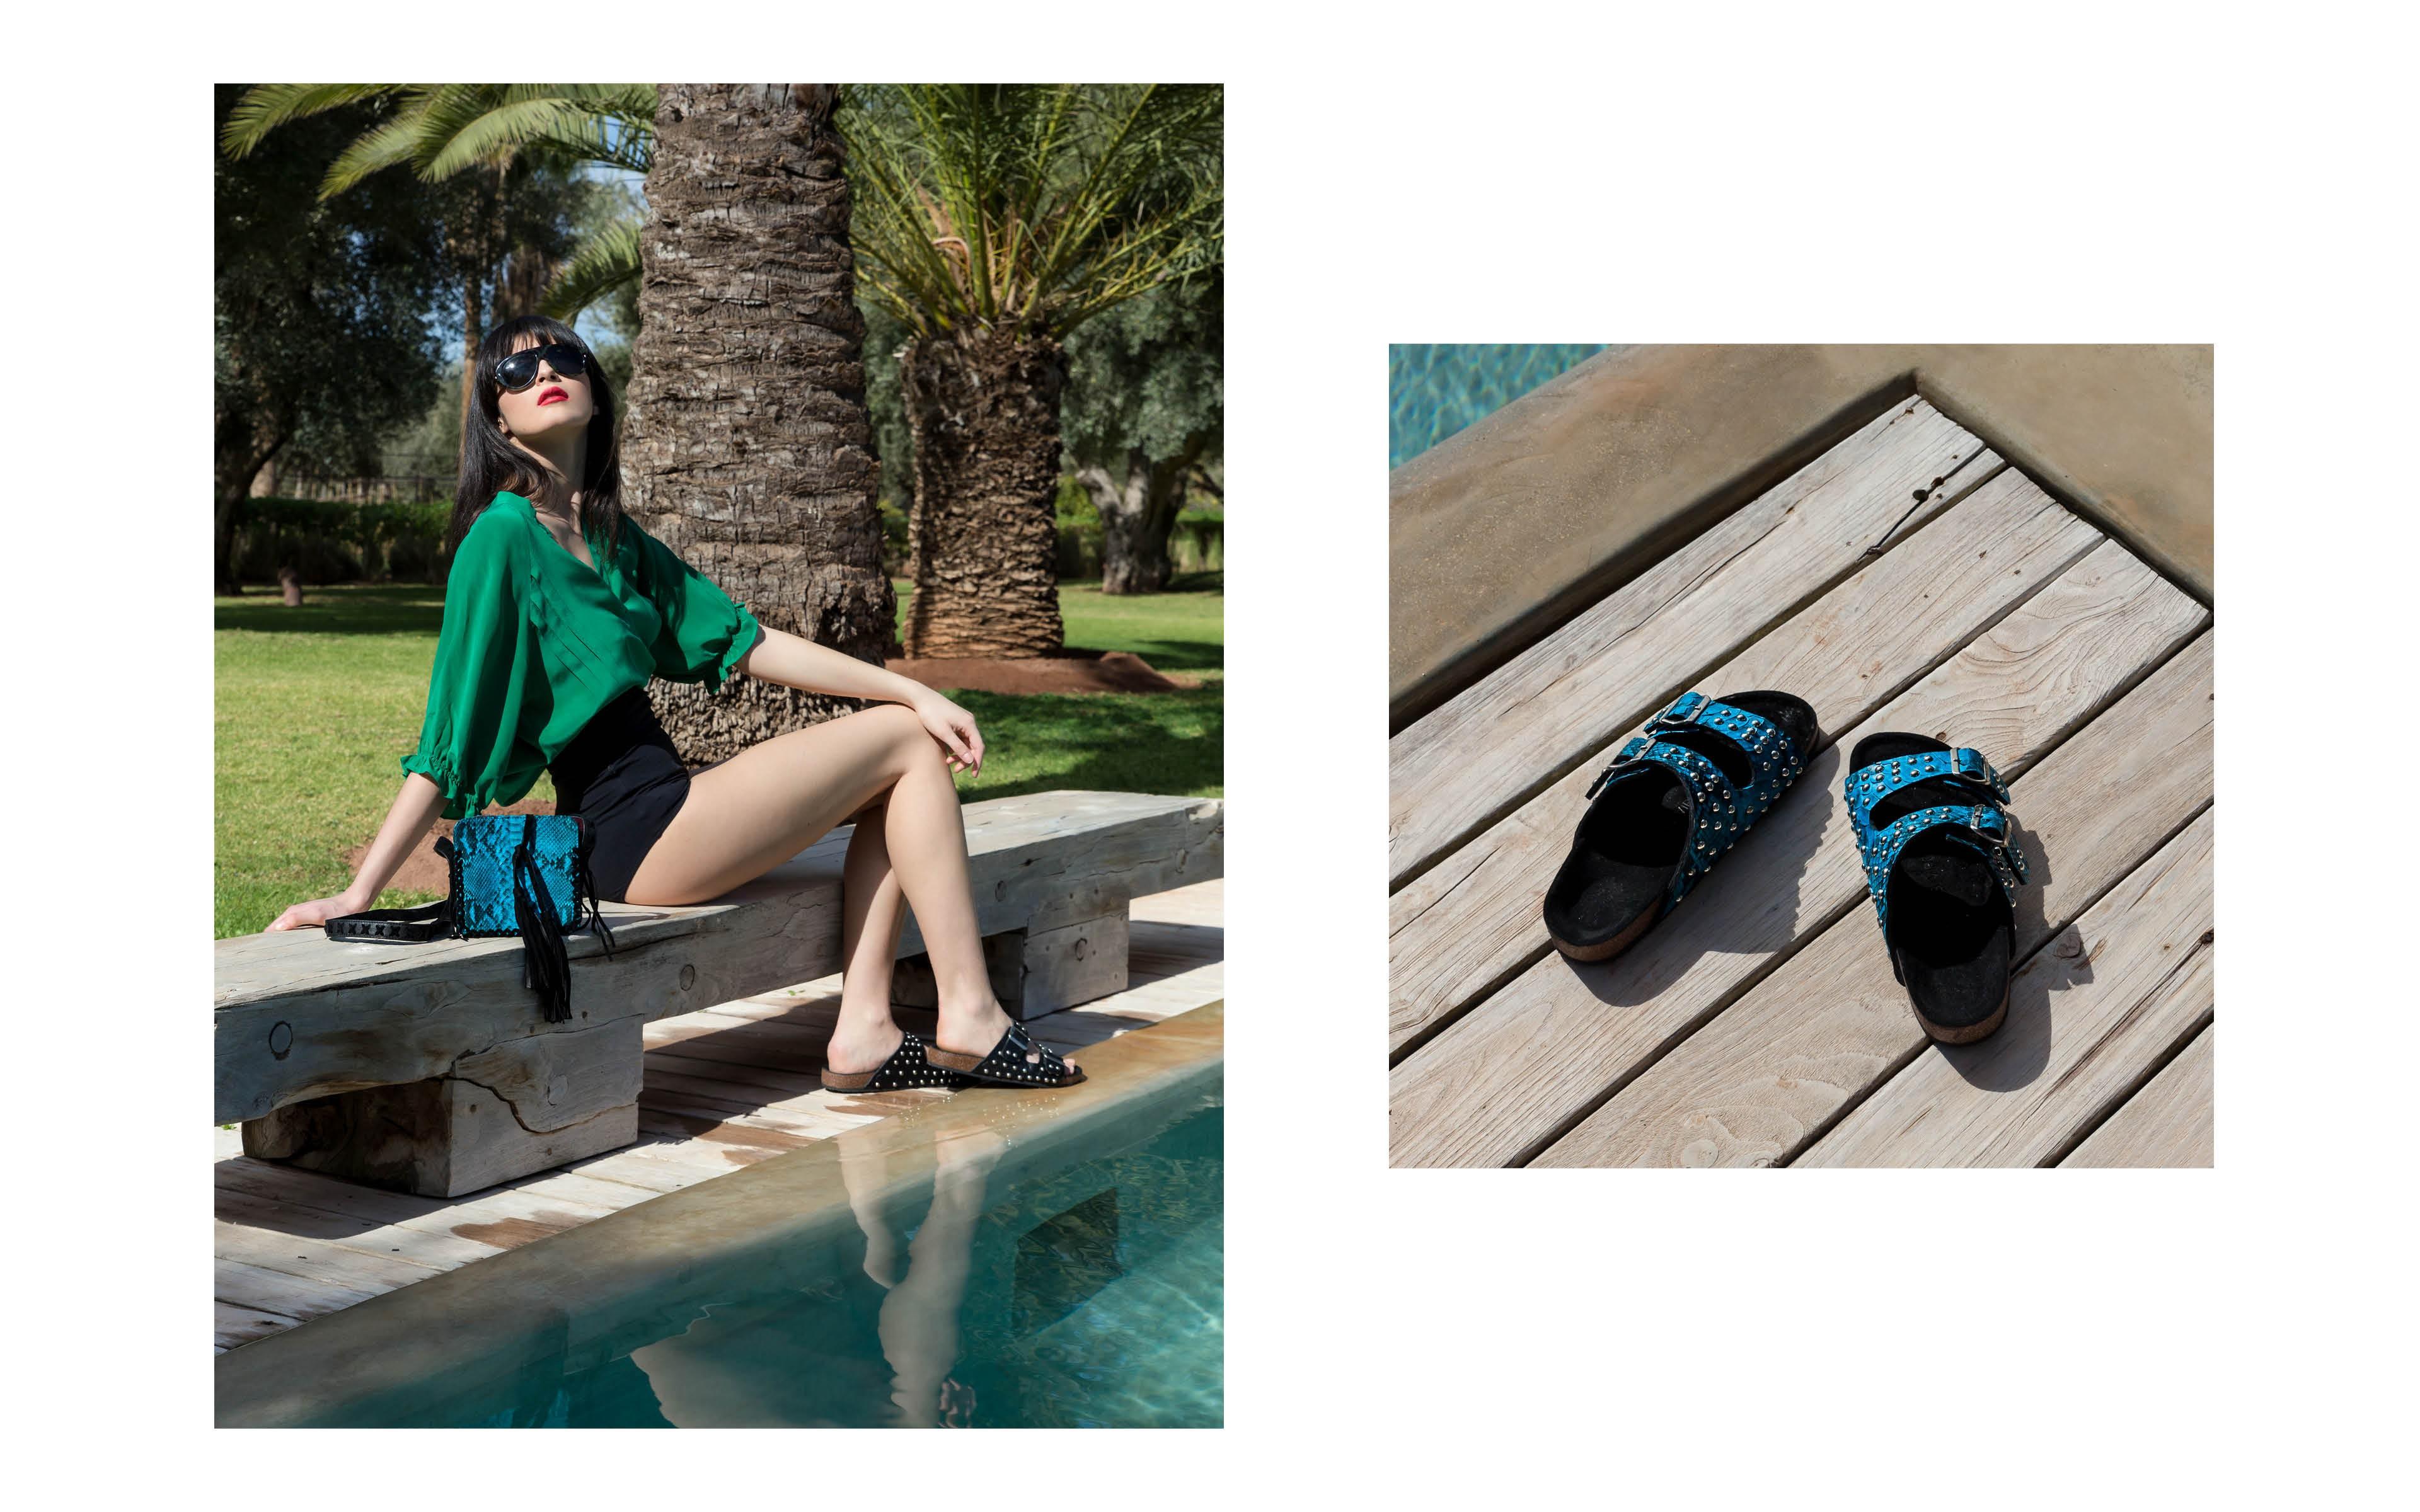 Chiara turquoise & Odette Turquoise